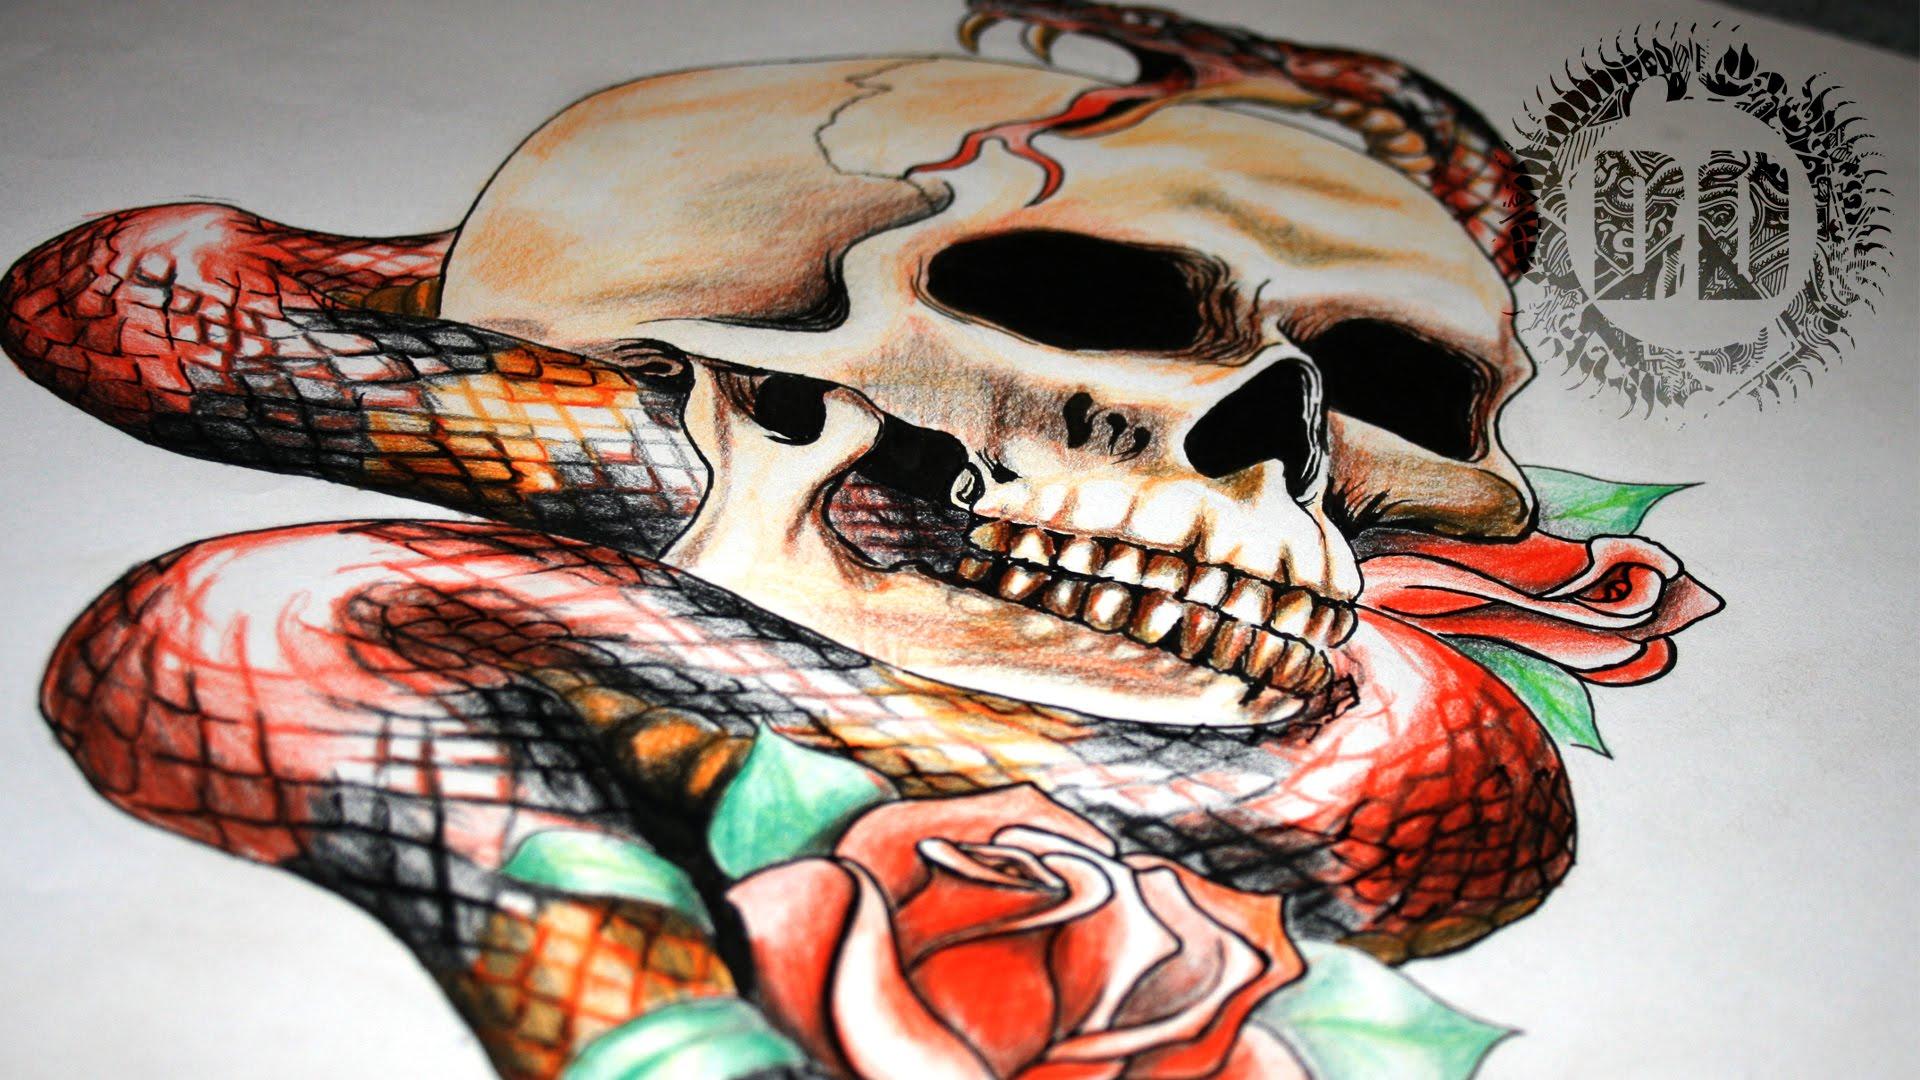 1920x1080 Skull And Snake Tattoo Design